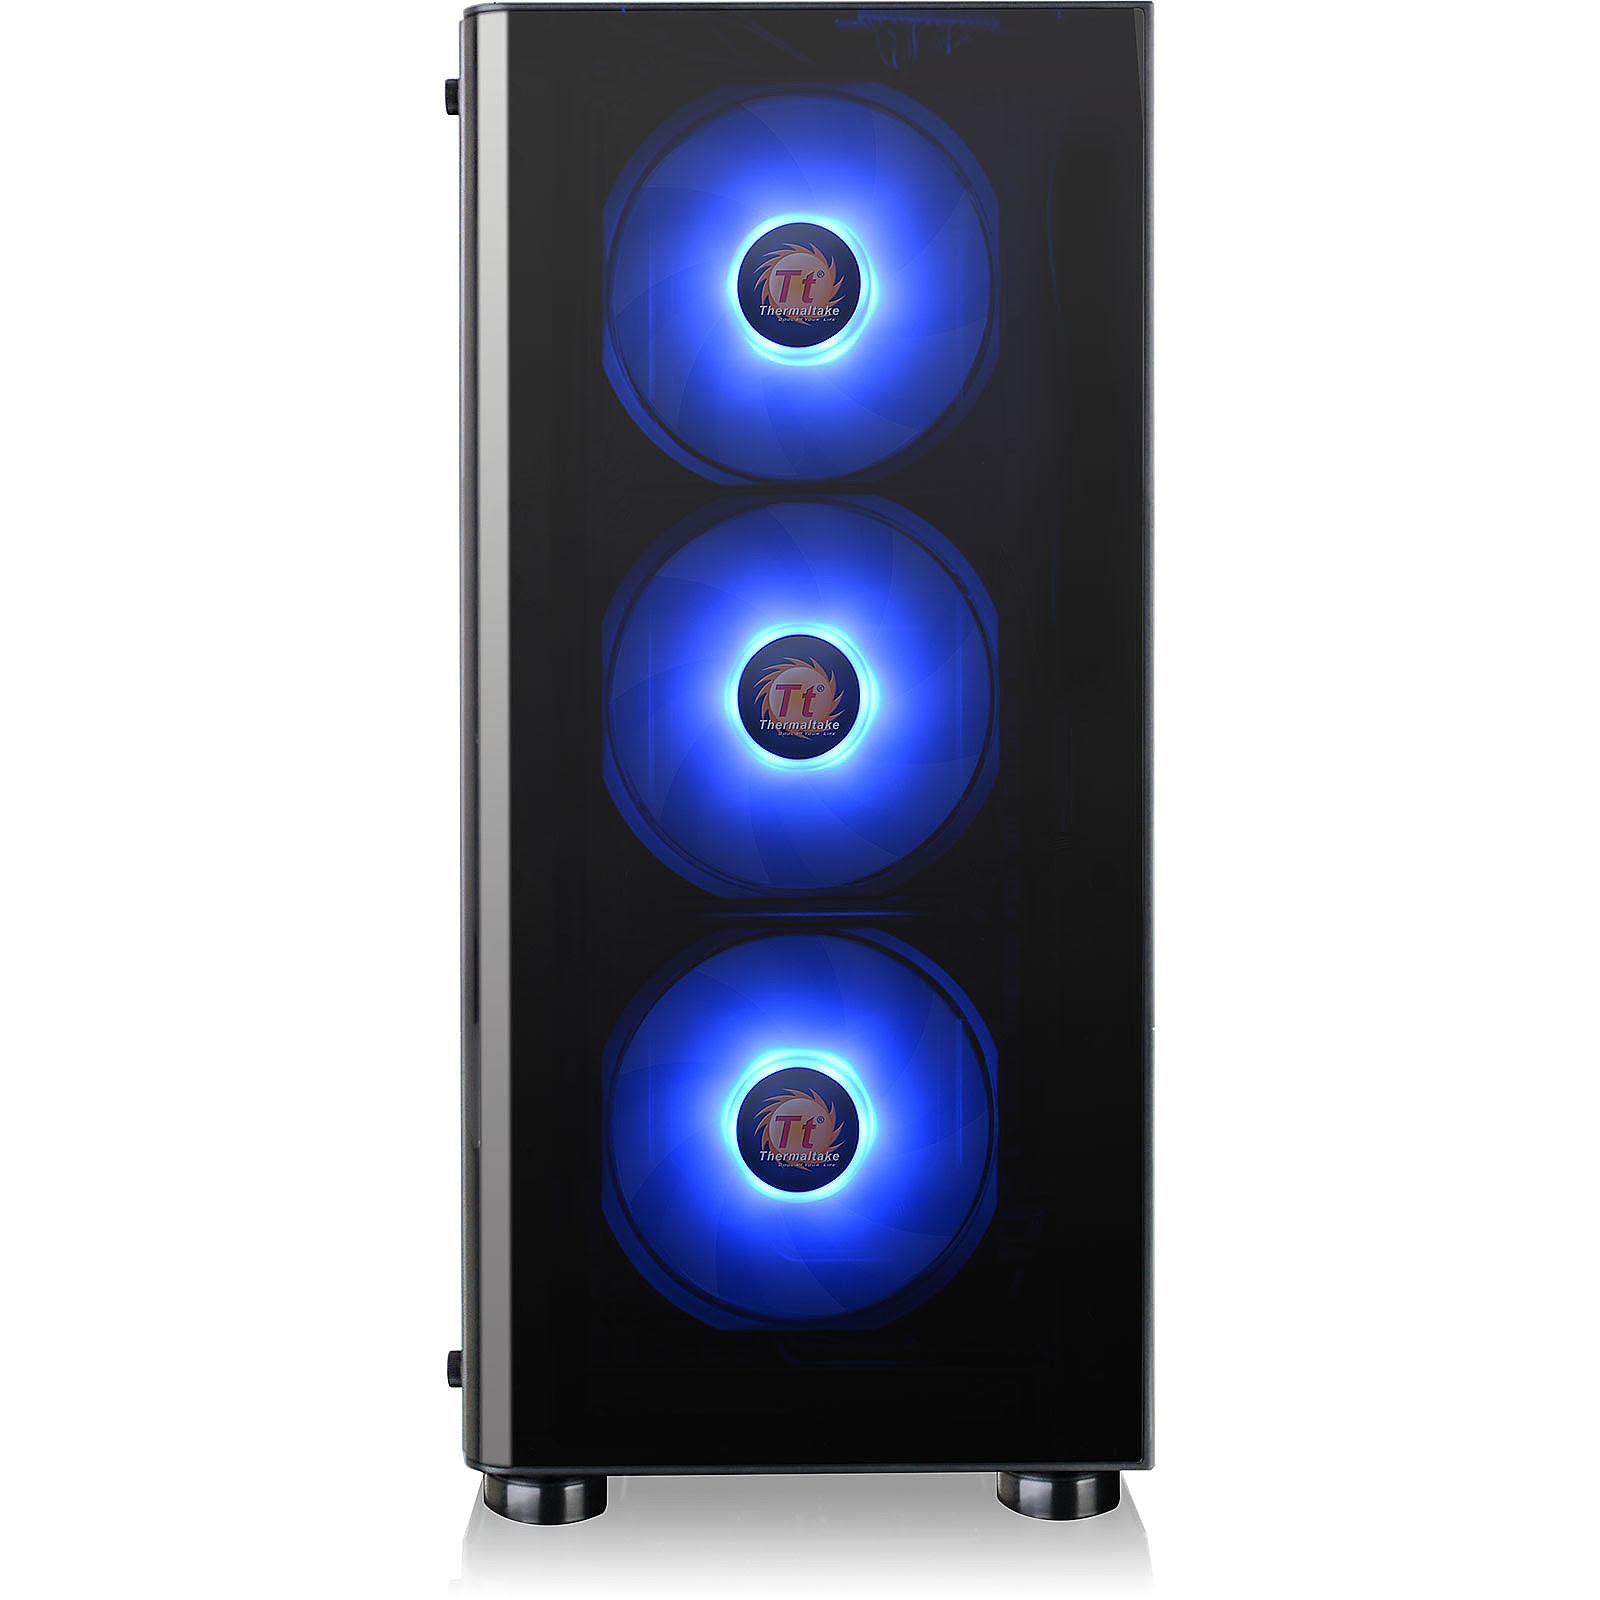 Thermaltake V200 TG RGB Edition Noir - Boîtier PC Thermaltake - 2